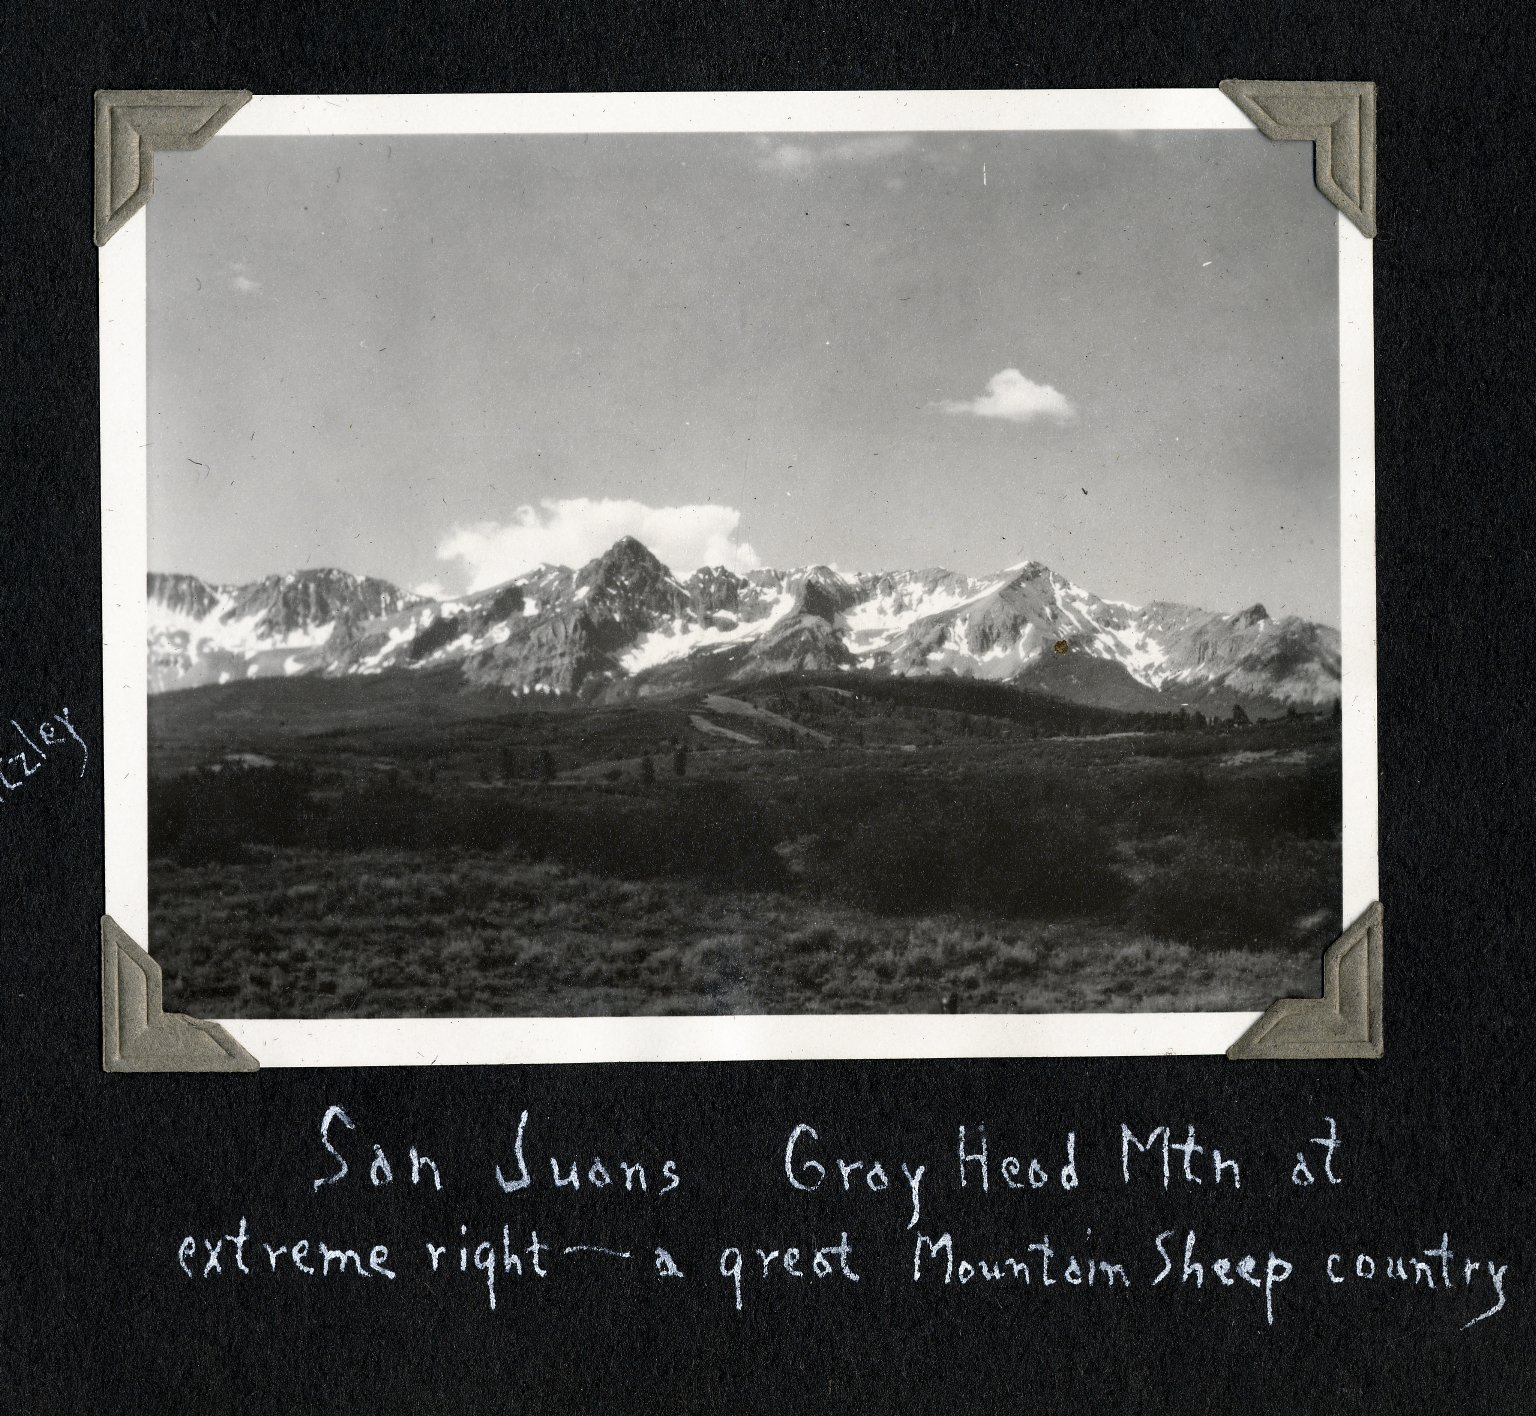 San Juan Mountains and Gray Head Peak